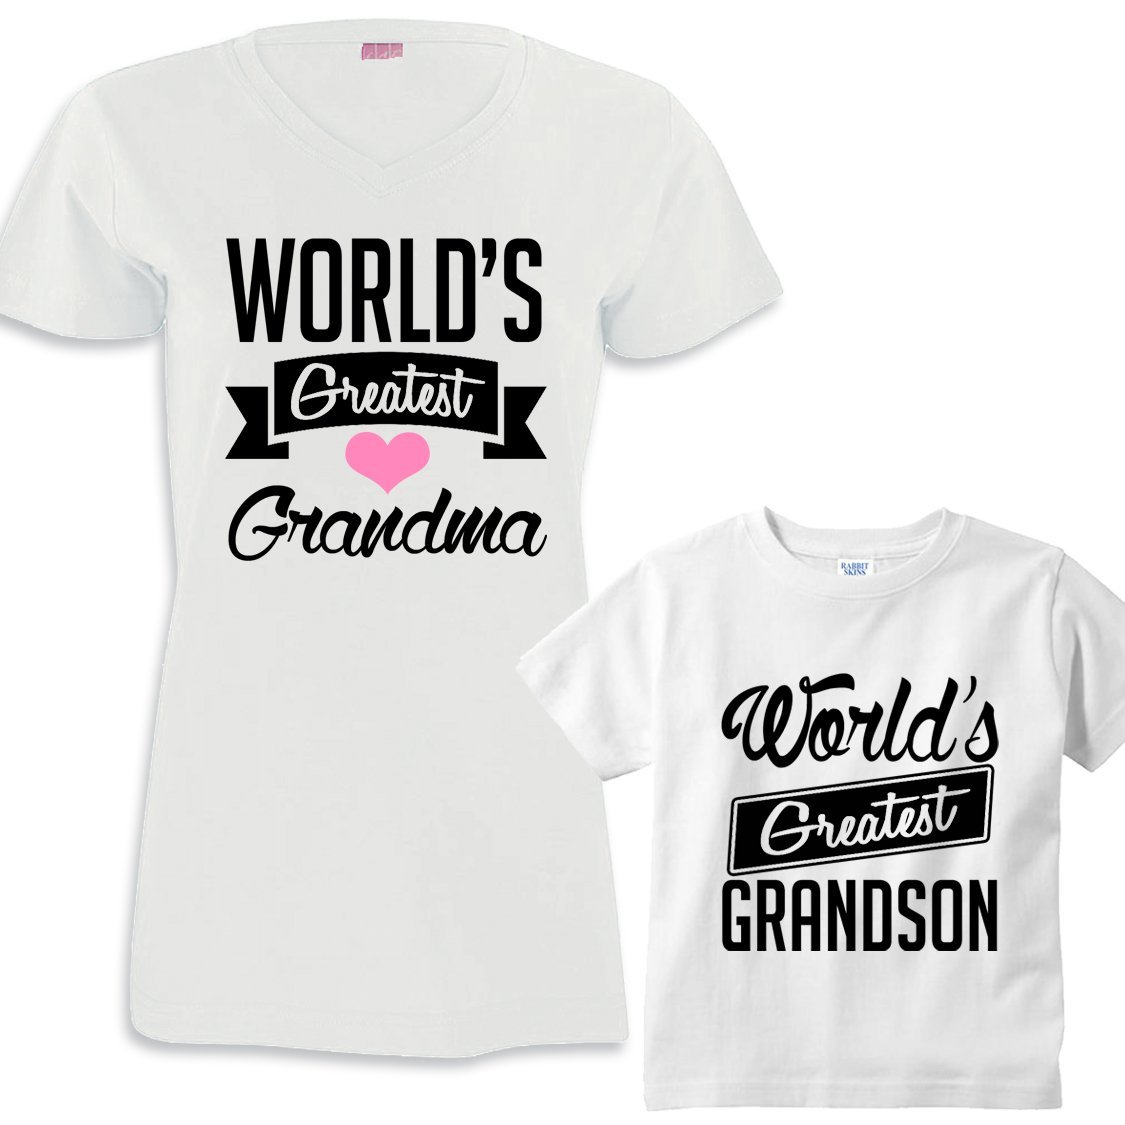 world s greatest grandma world s greatest grandson matching shirt